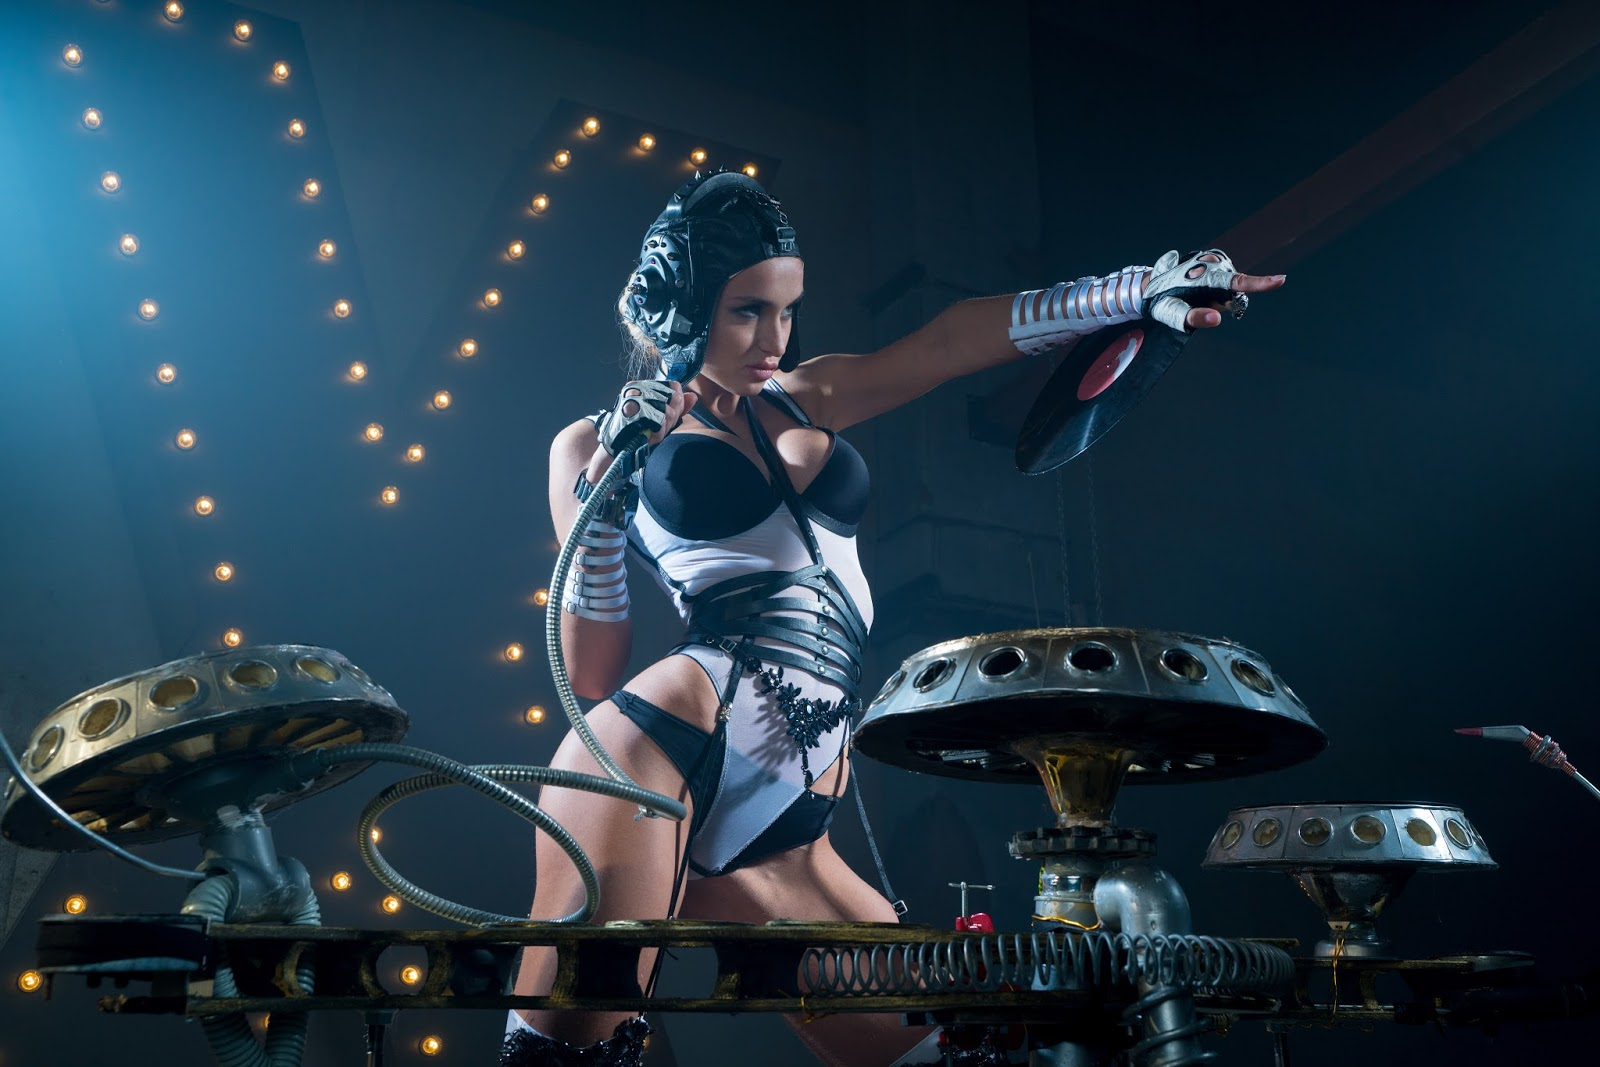 New woman sex dj female singer gogo hip hop jazz dance costume suit